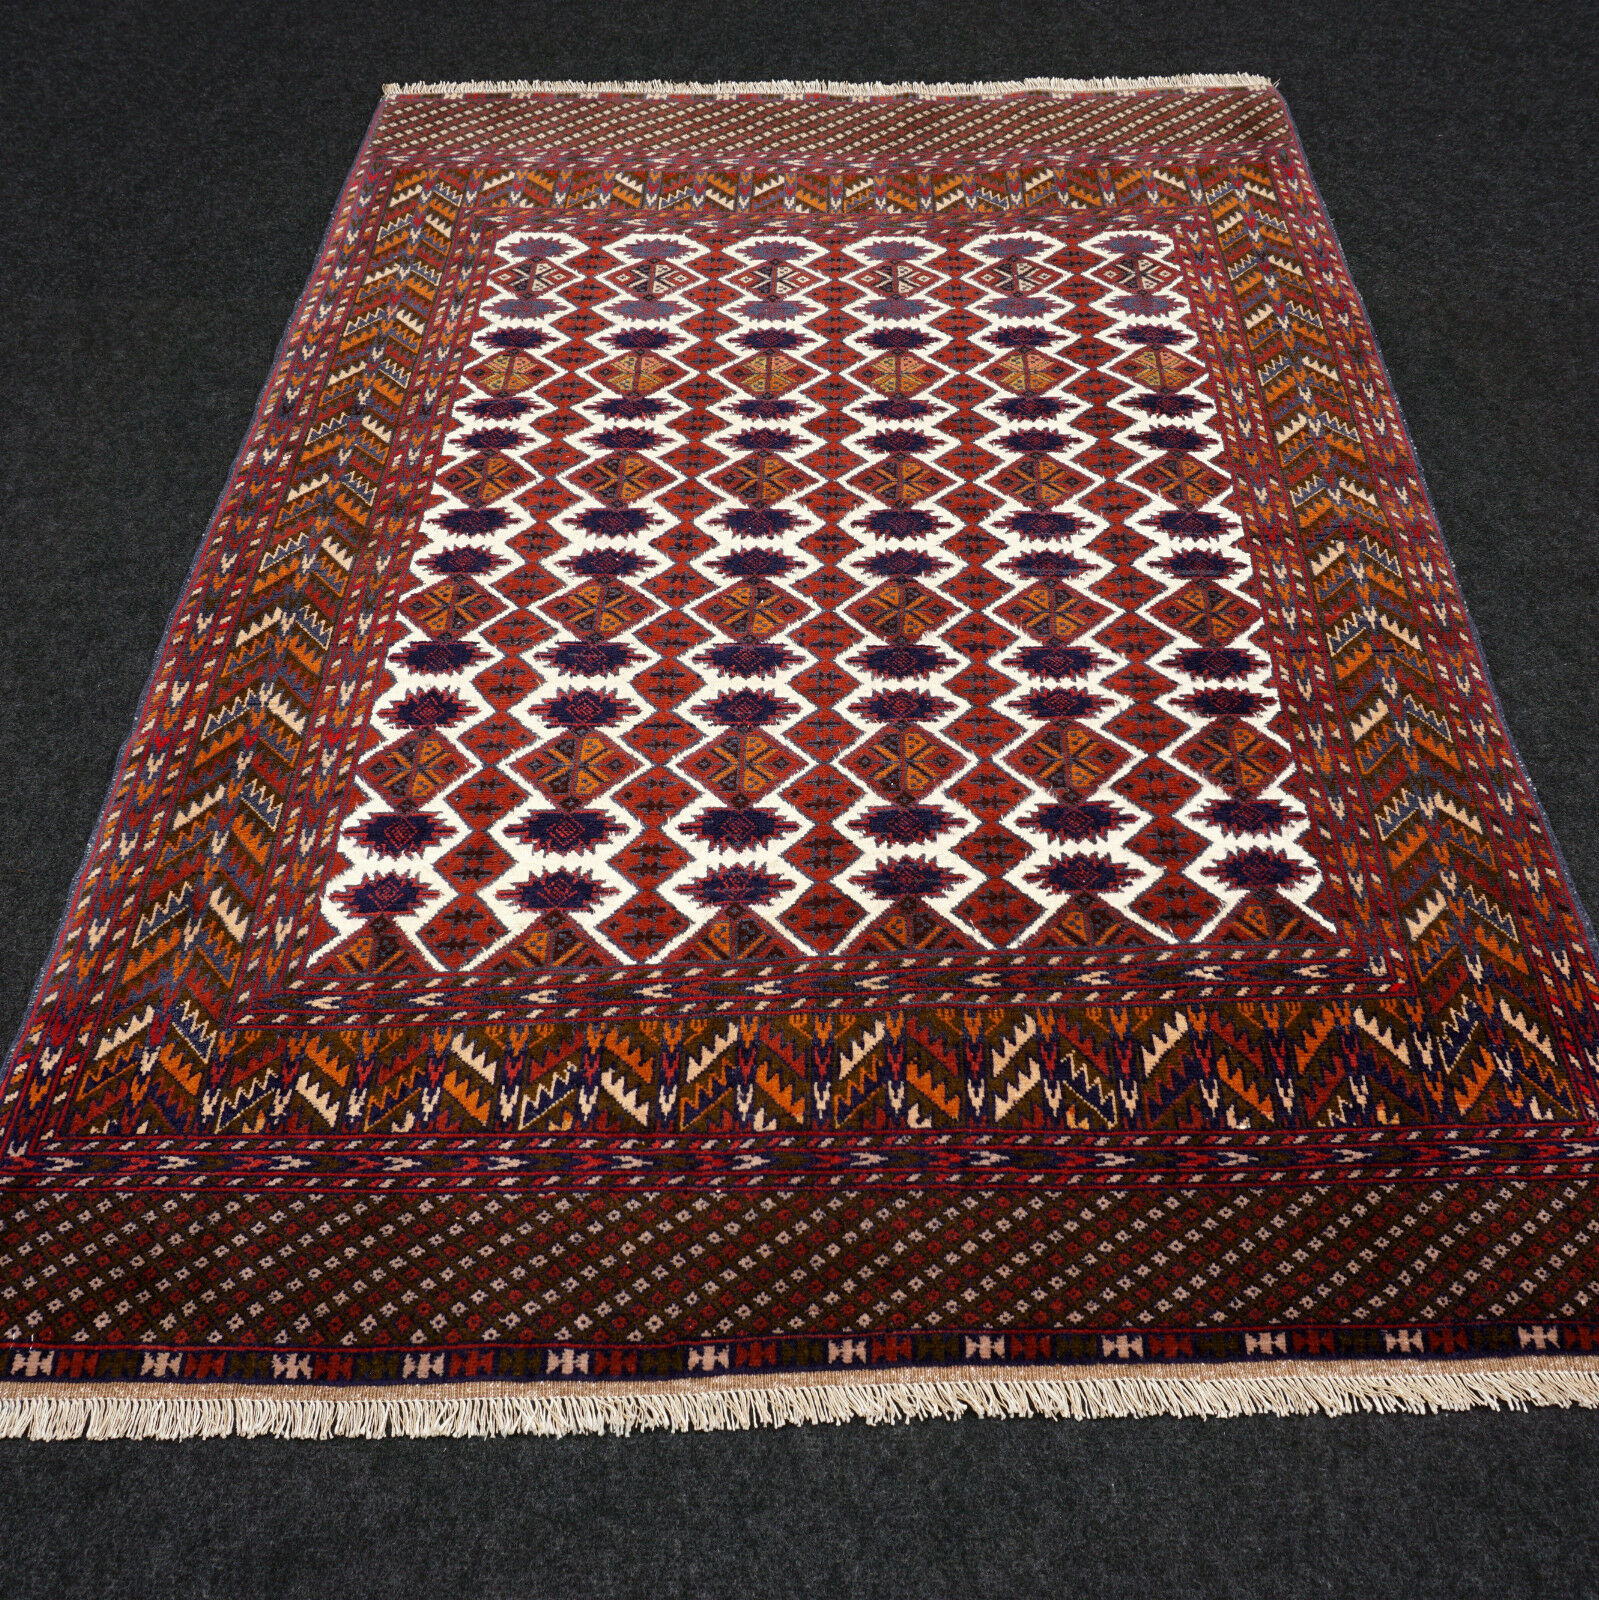 Orient alfombra Afghan 168 x 117 cm Tekke seidenteppich Turkmen Jomud Carpet Rug